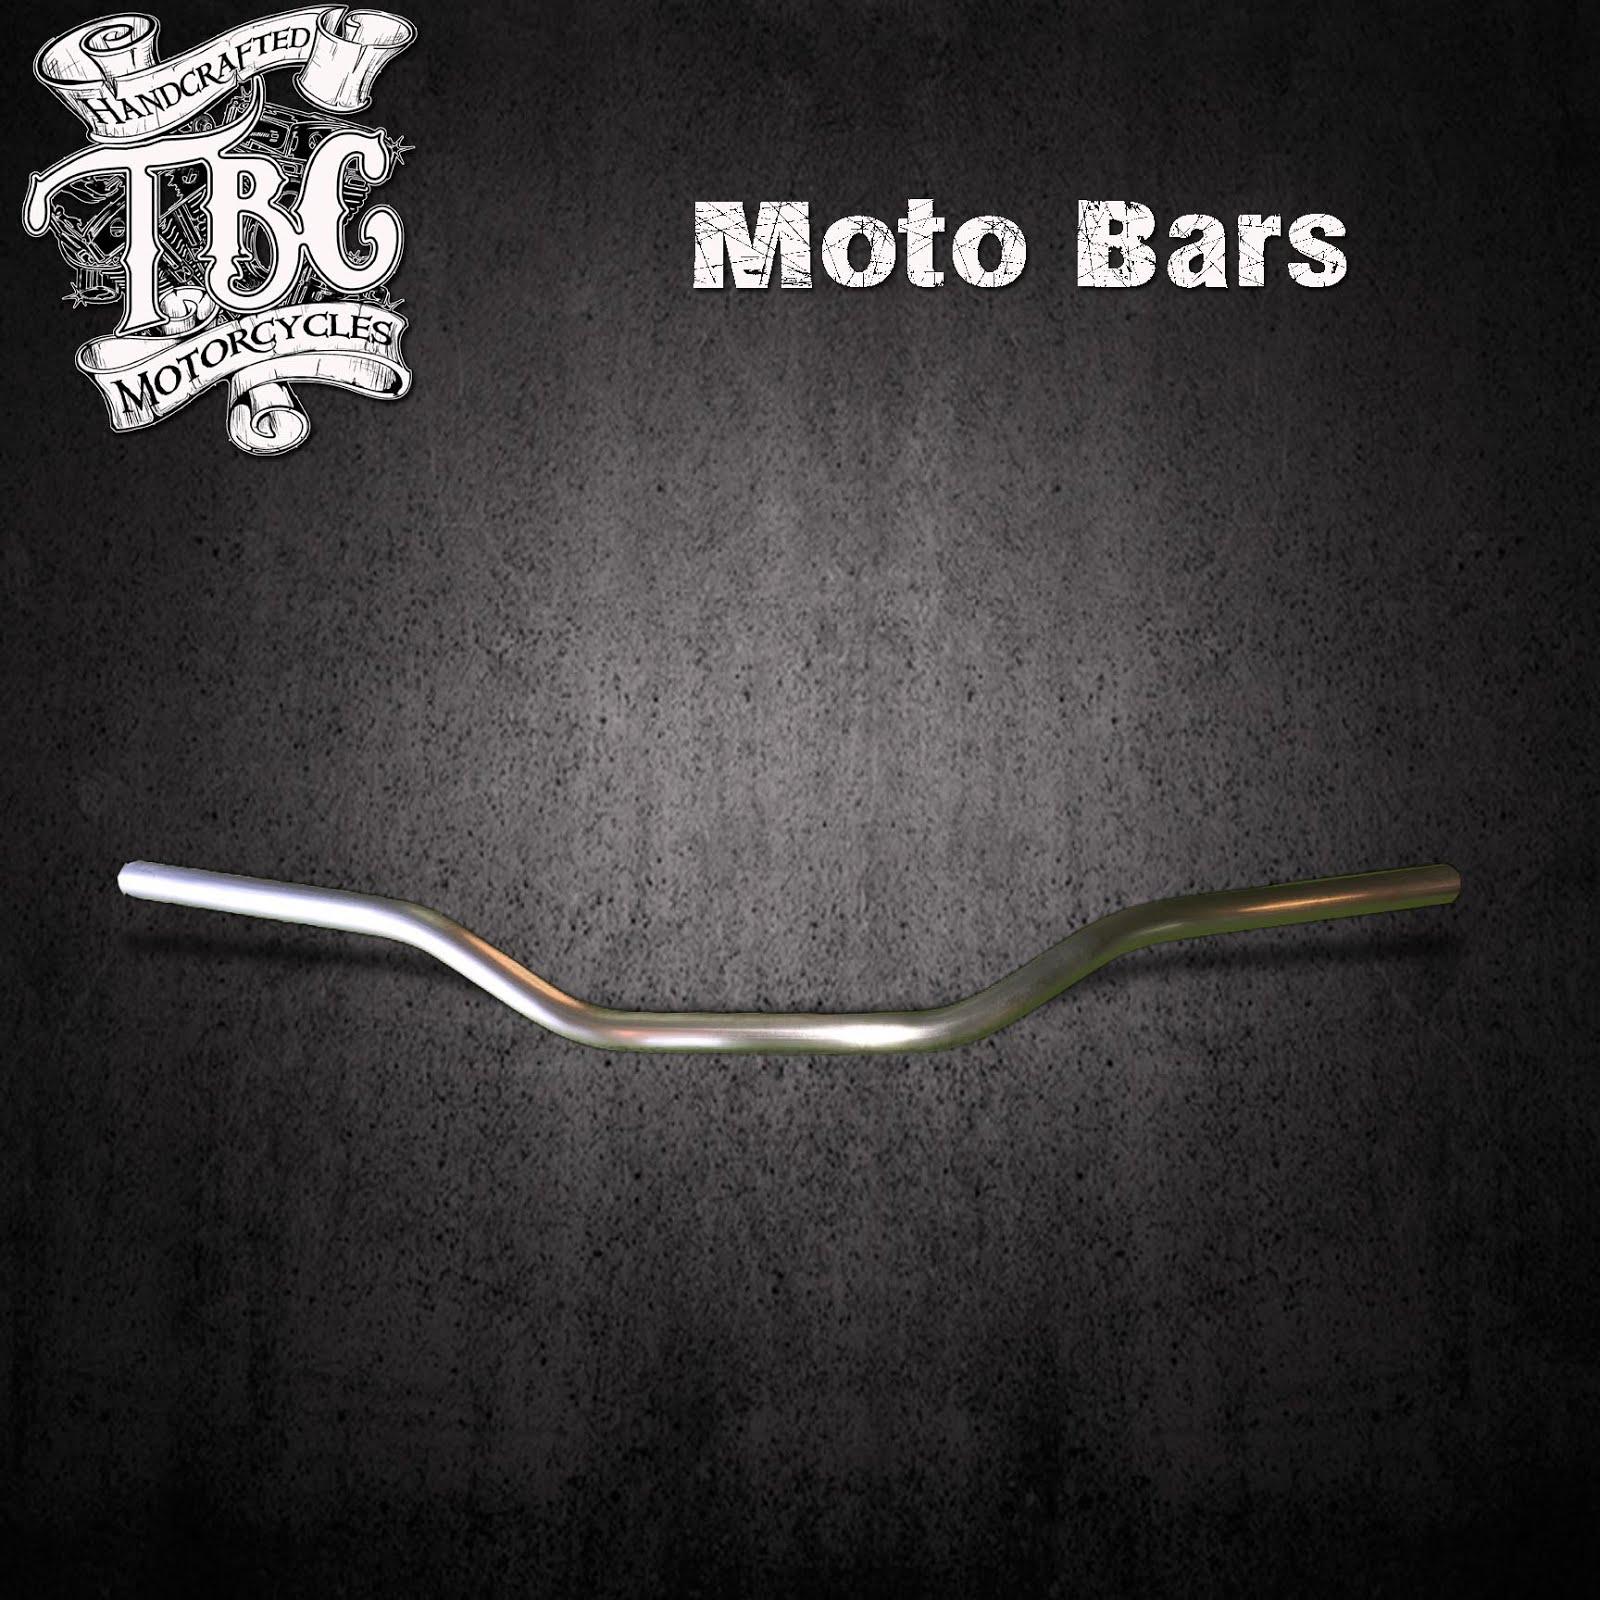 Moto Bars